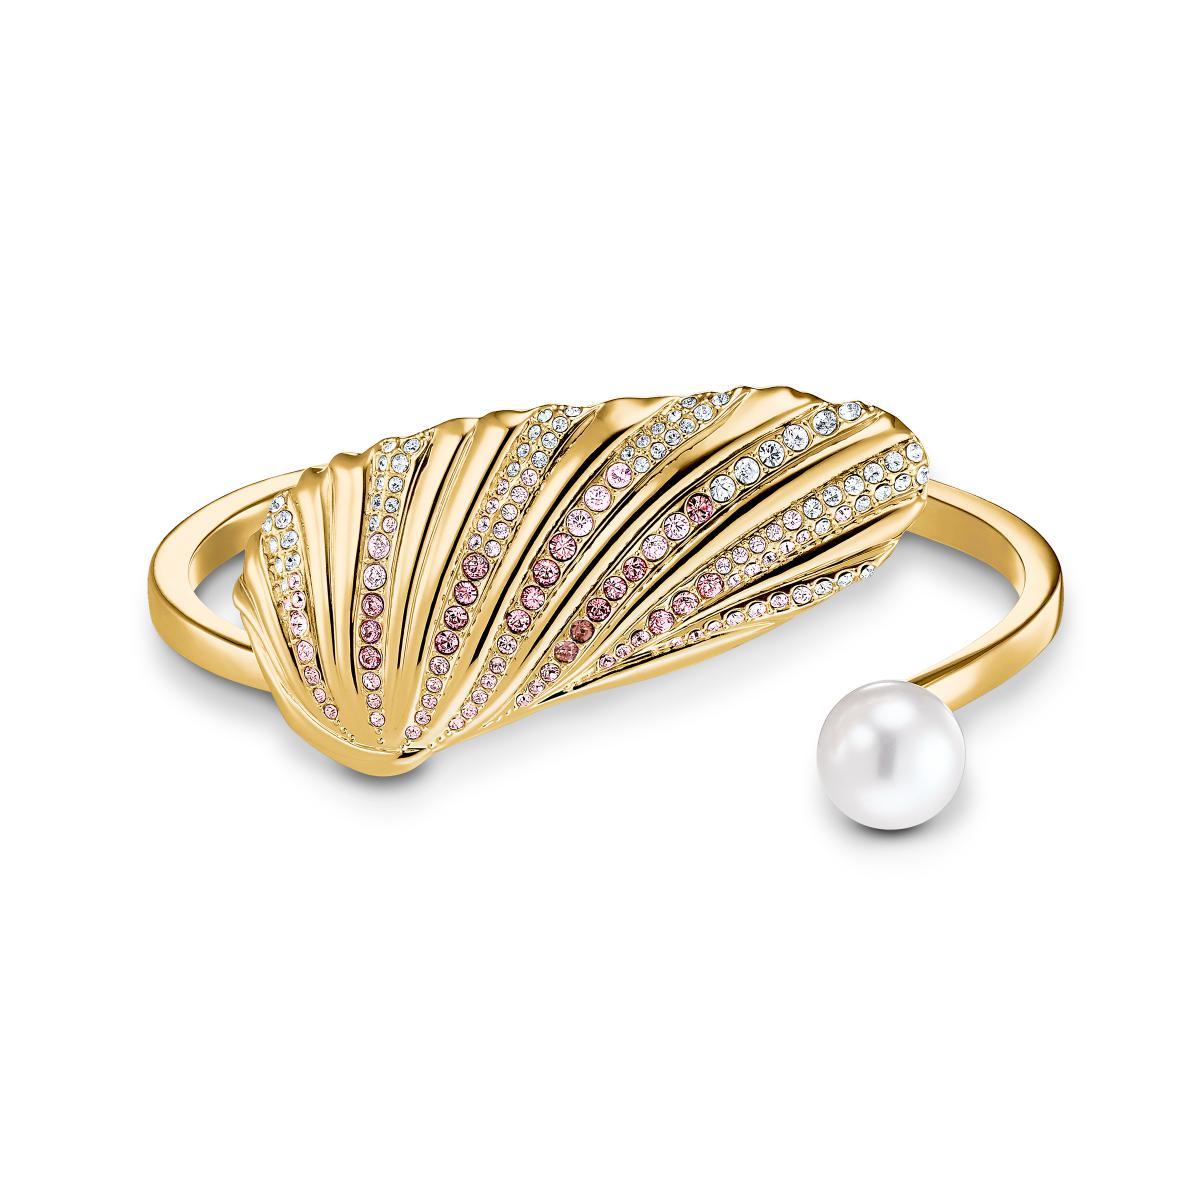 Bracelet Swarovski 5520665 - Bracelet métal or coque sertis et perle blanc  Femme